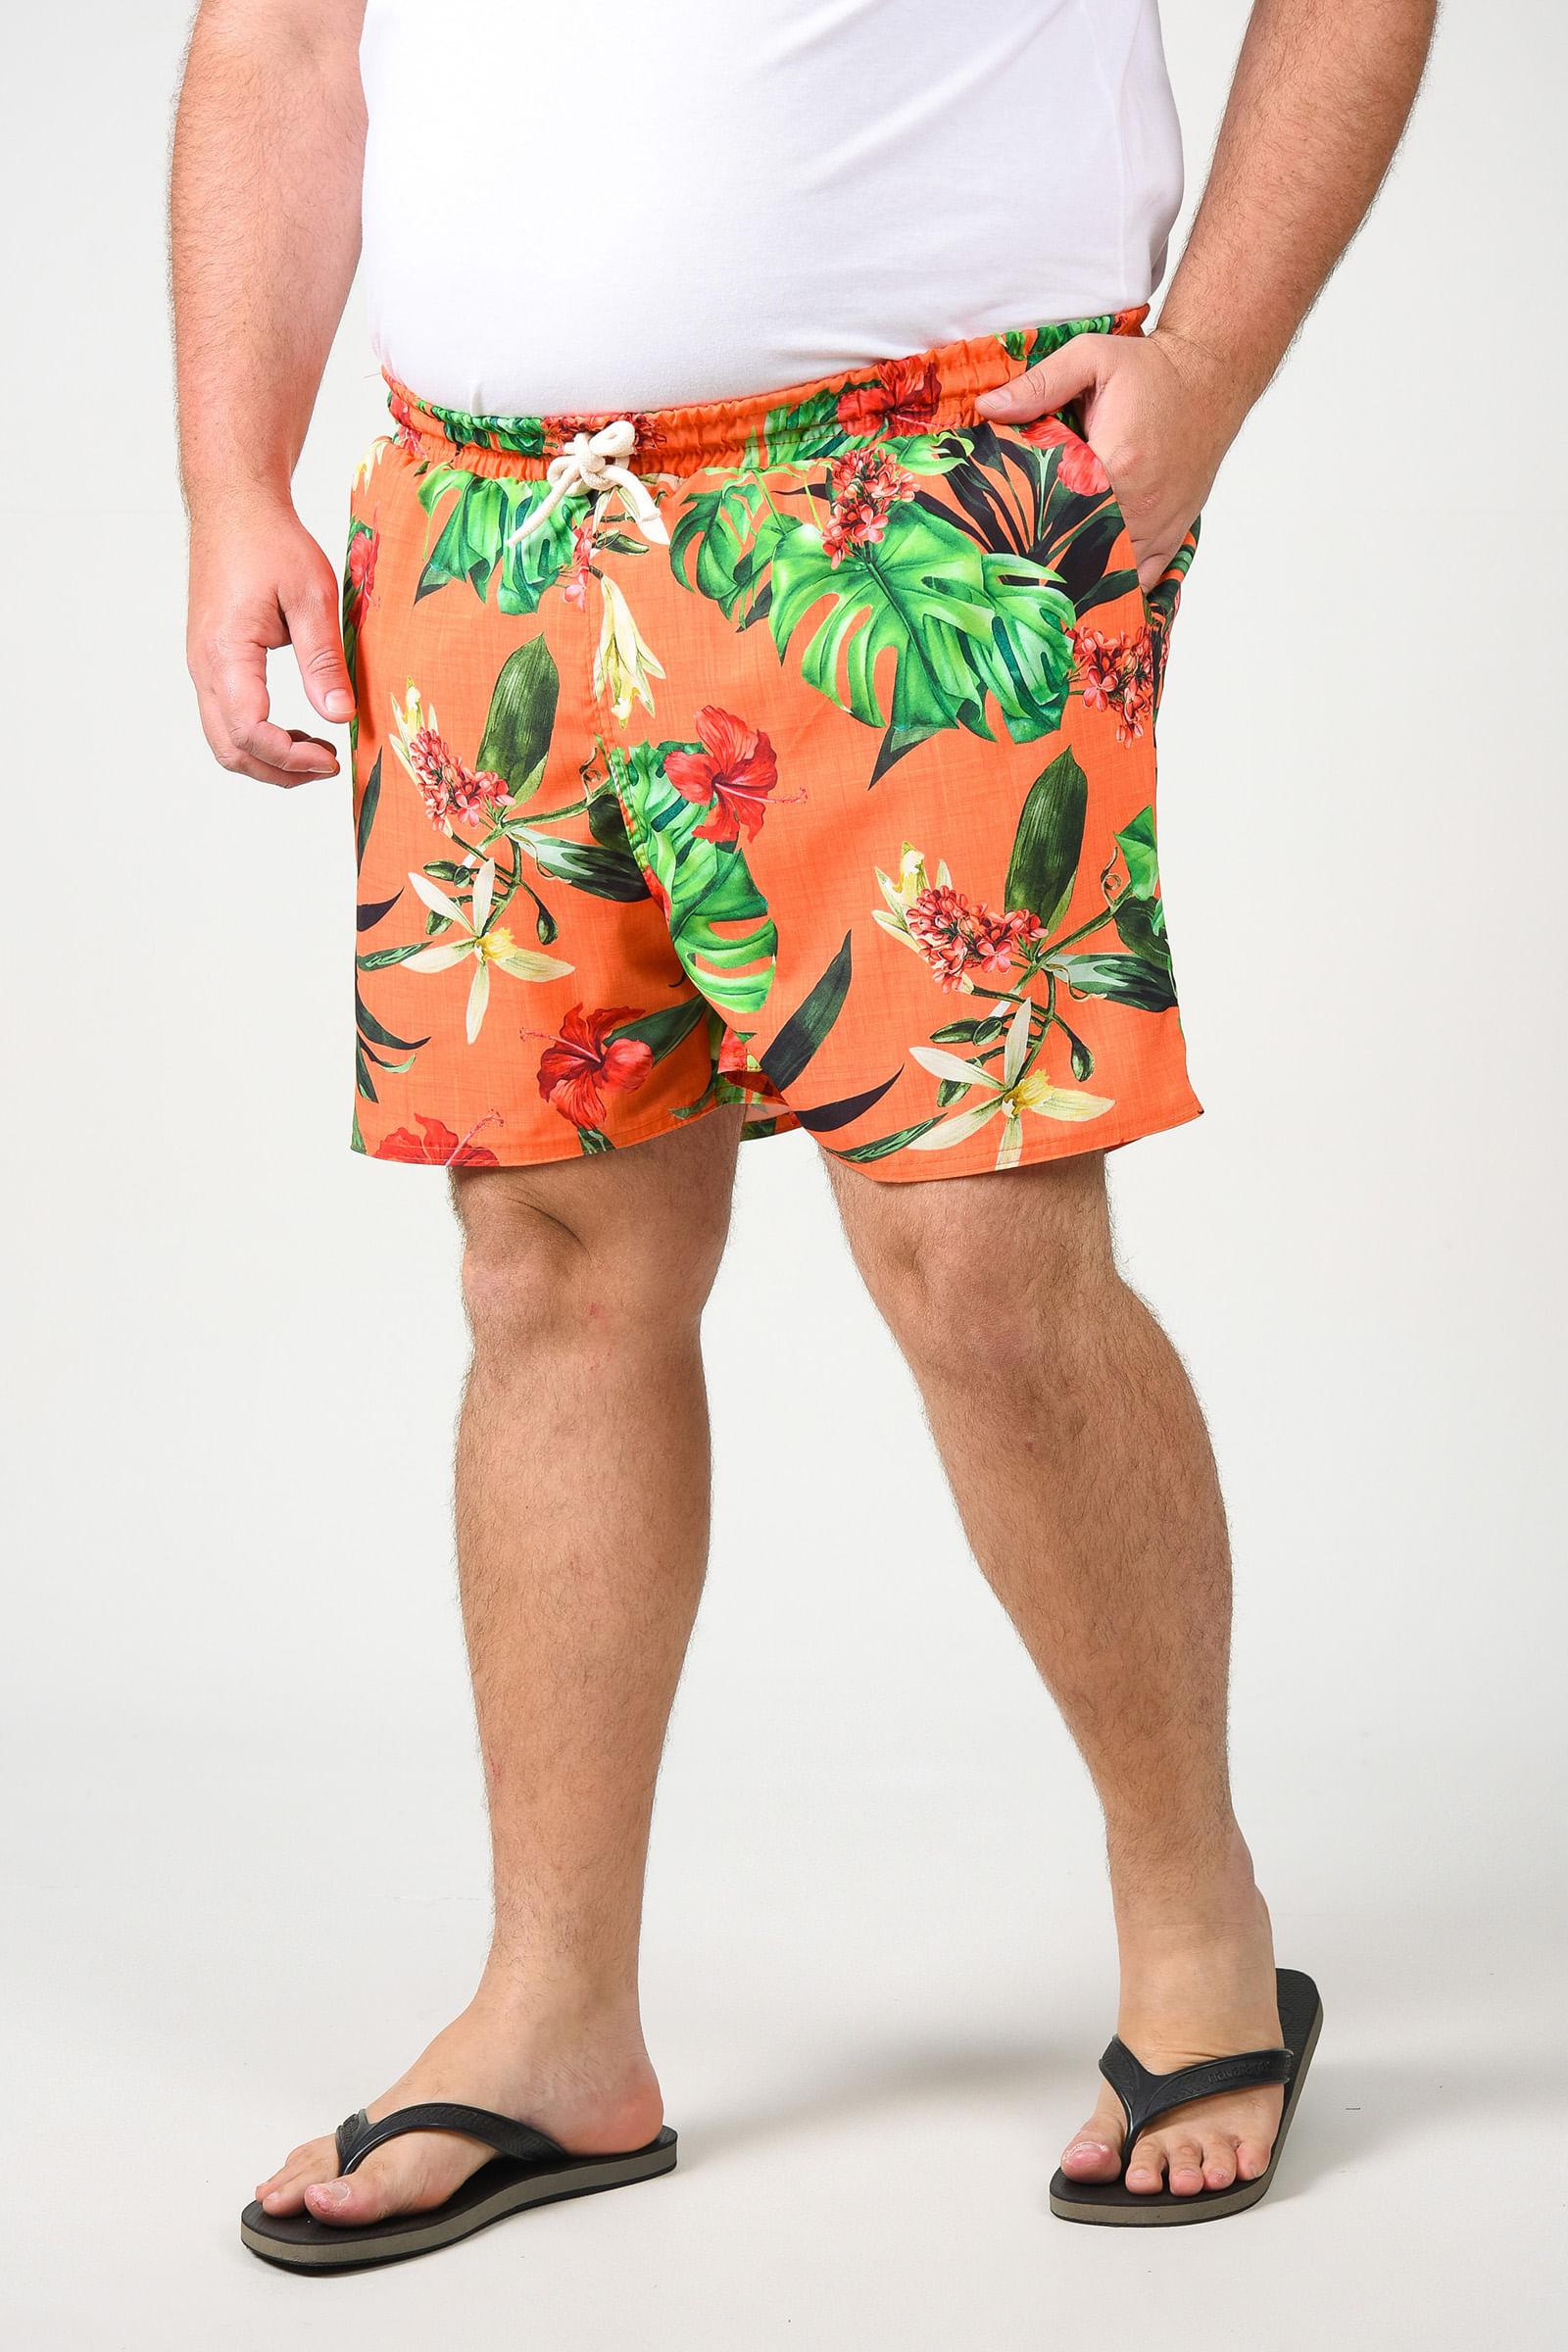 Shorts de tactel estampado plus size laranja